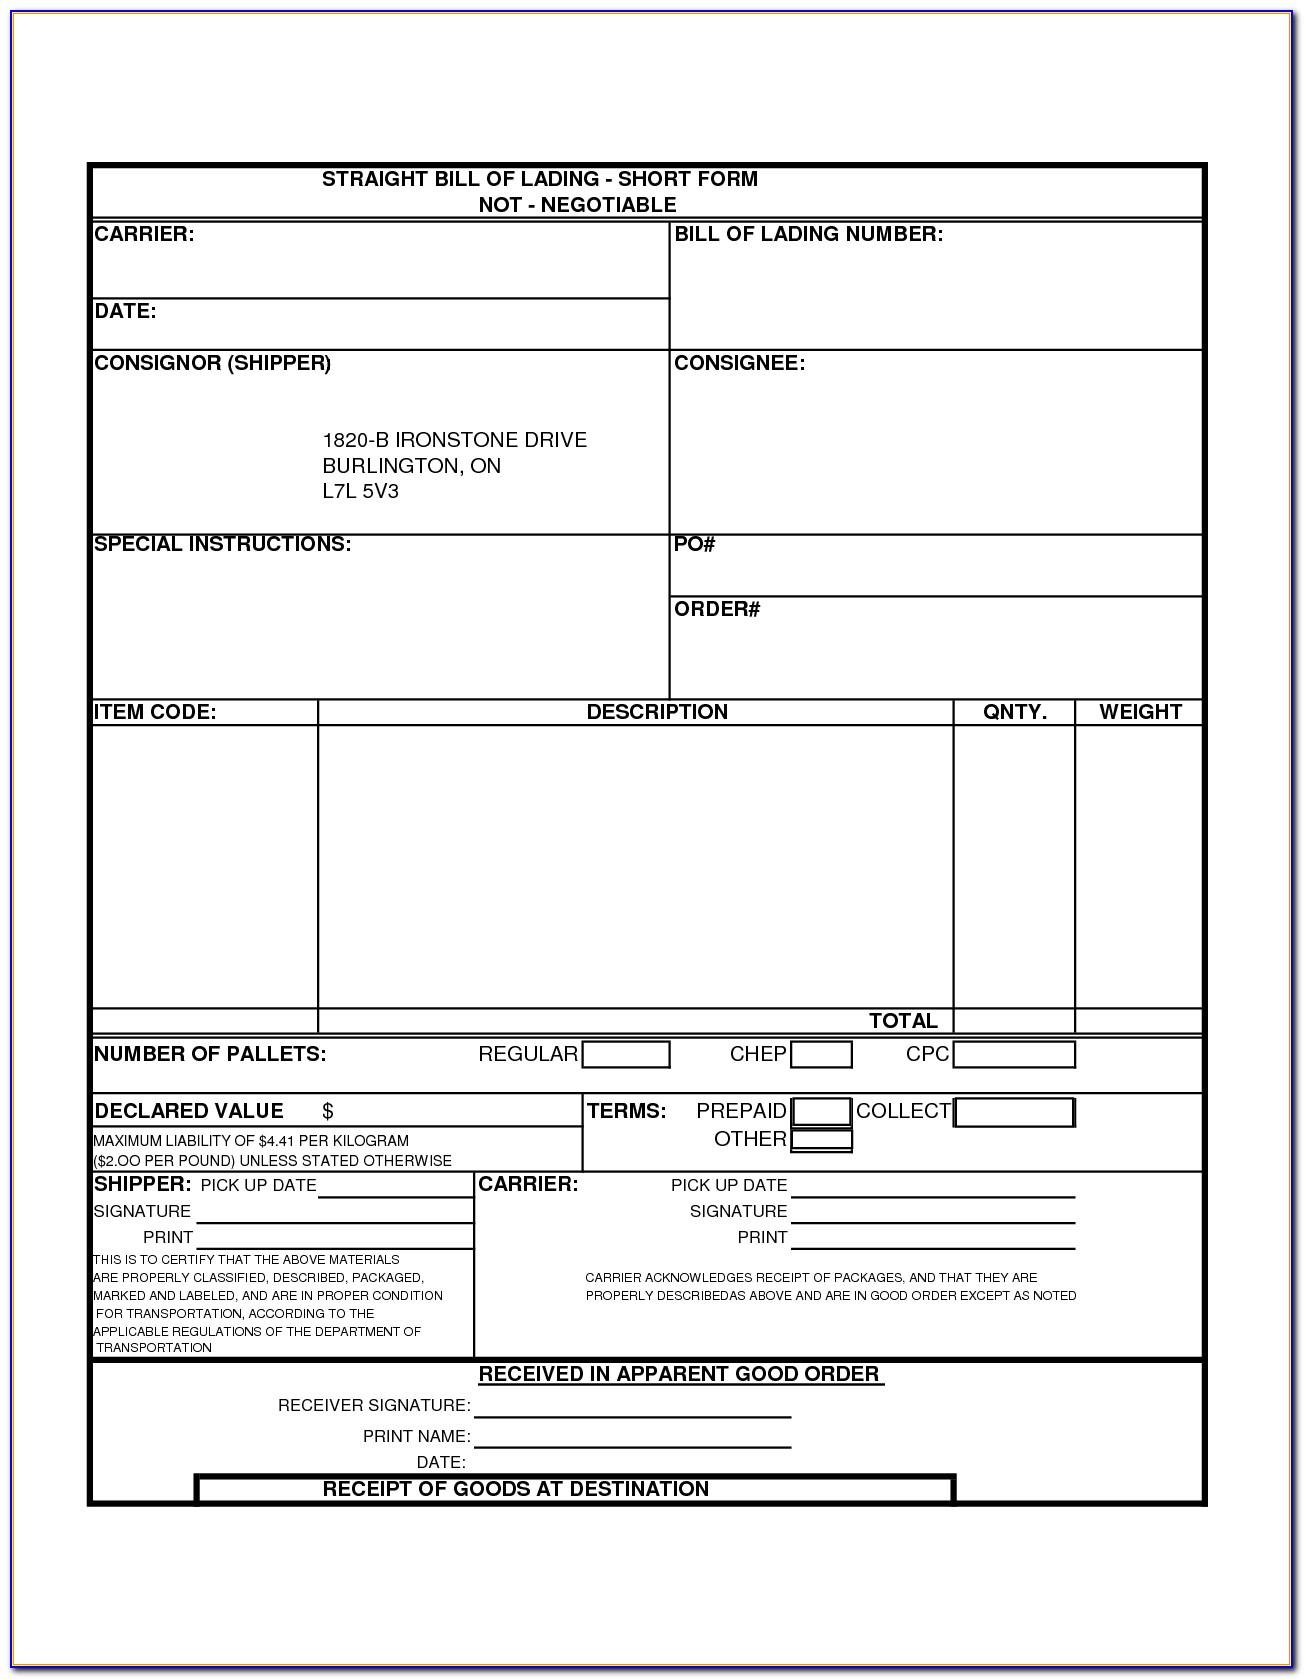 Bill Of Lading Form Pdf